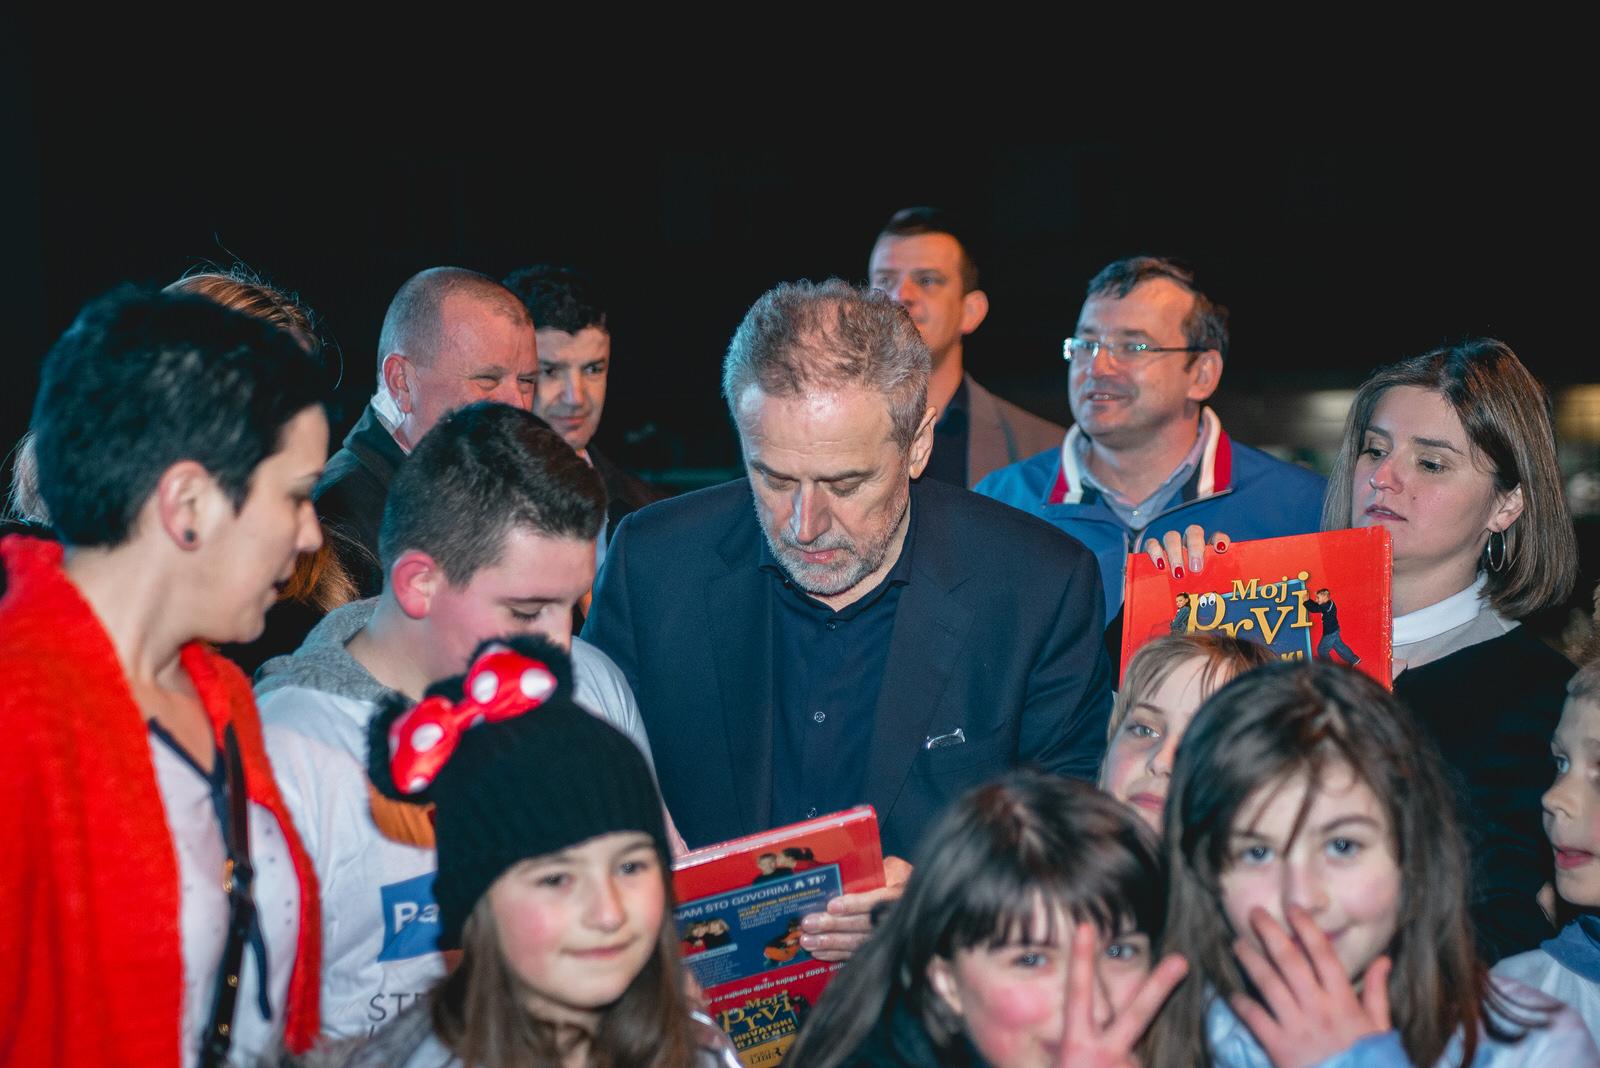 likaclub_milan-bandić-lički-osik_2019-15